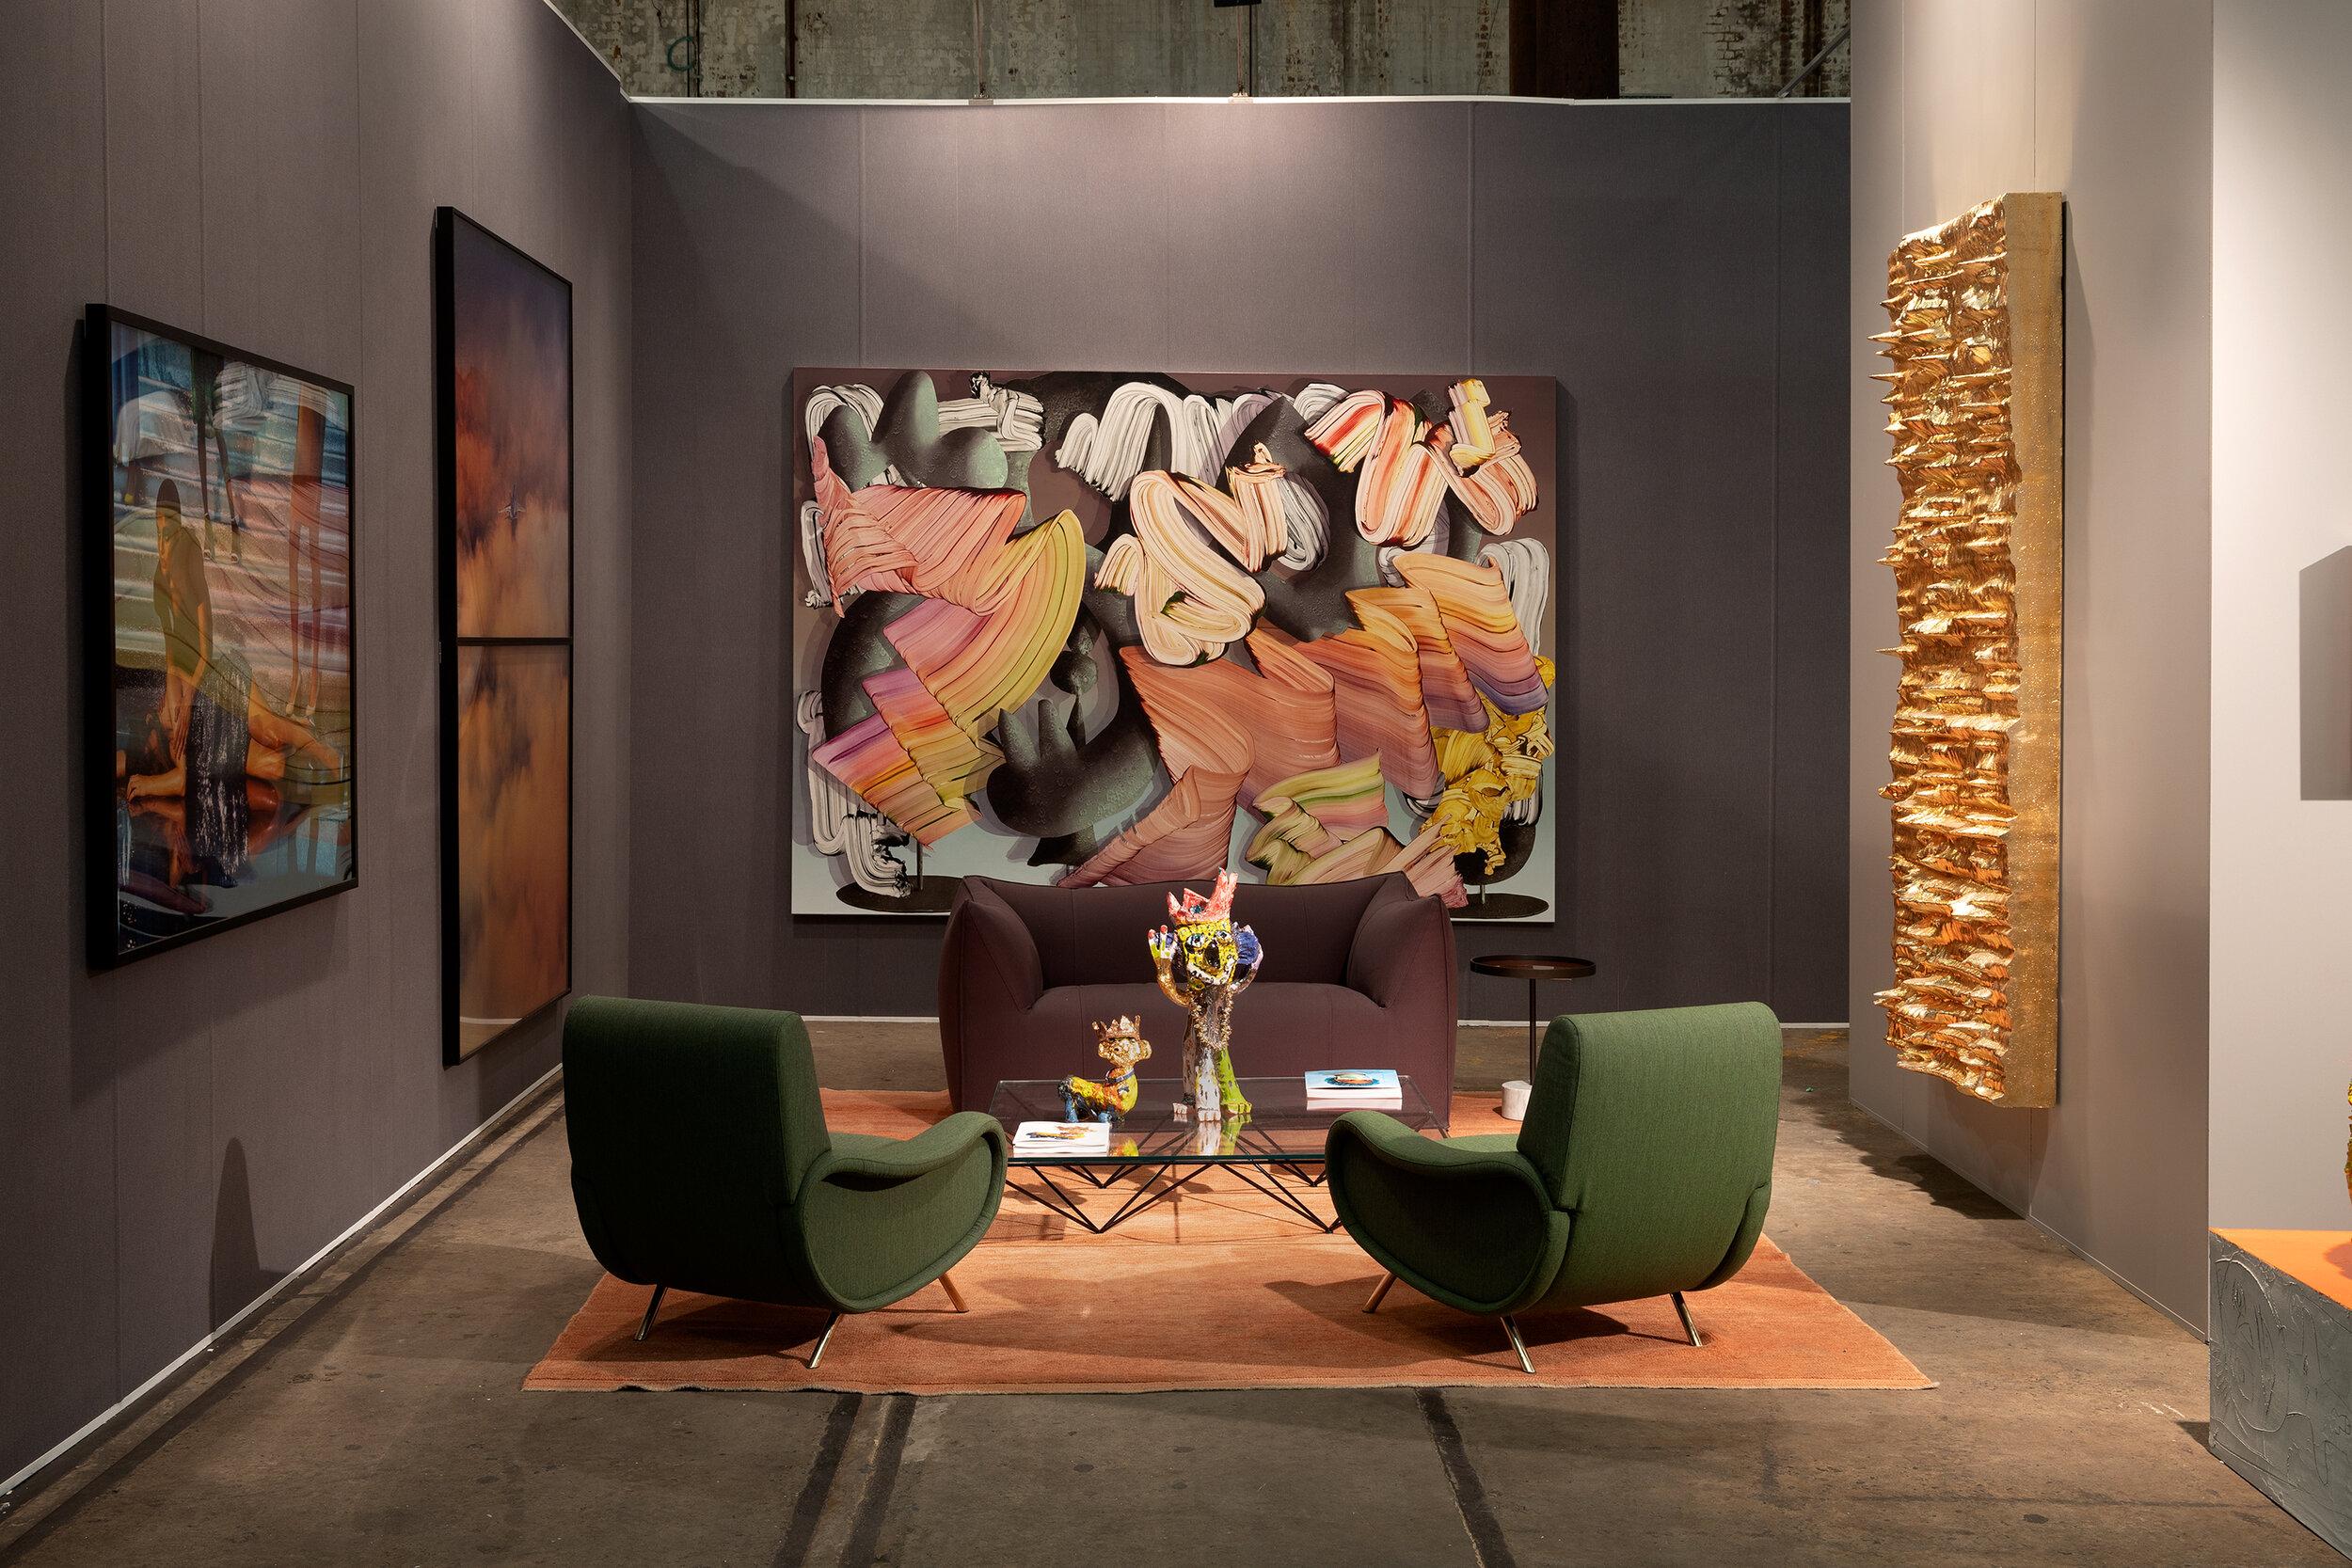 Cassina Lady armchairs and B&B Italia's Le Bambole Sofa sit comfortably at Sullivan & Strumpf's stand at Sydney Contemporary.